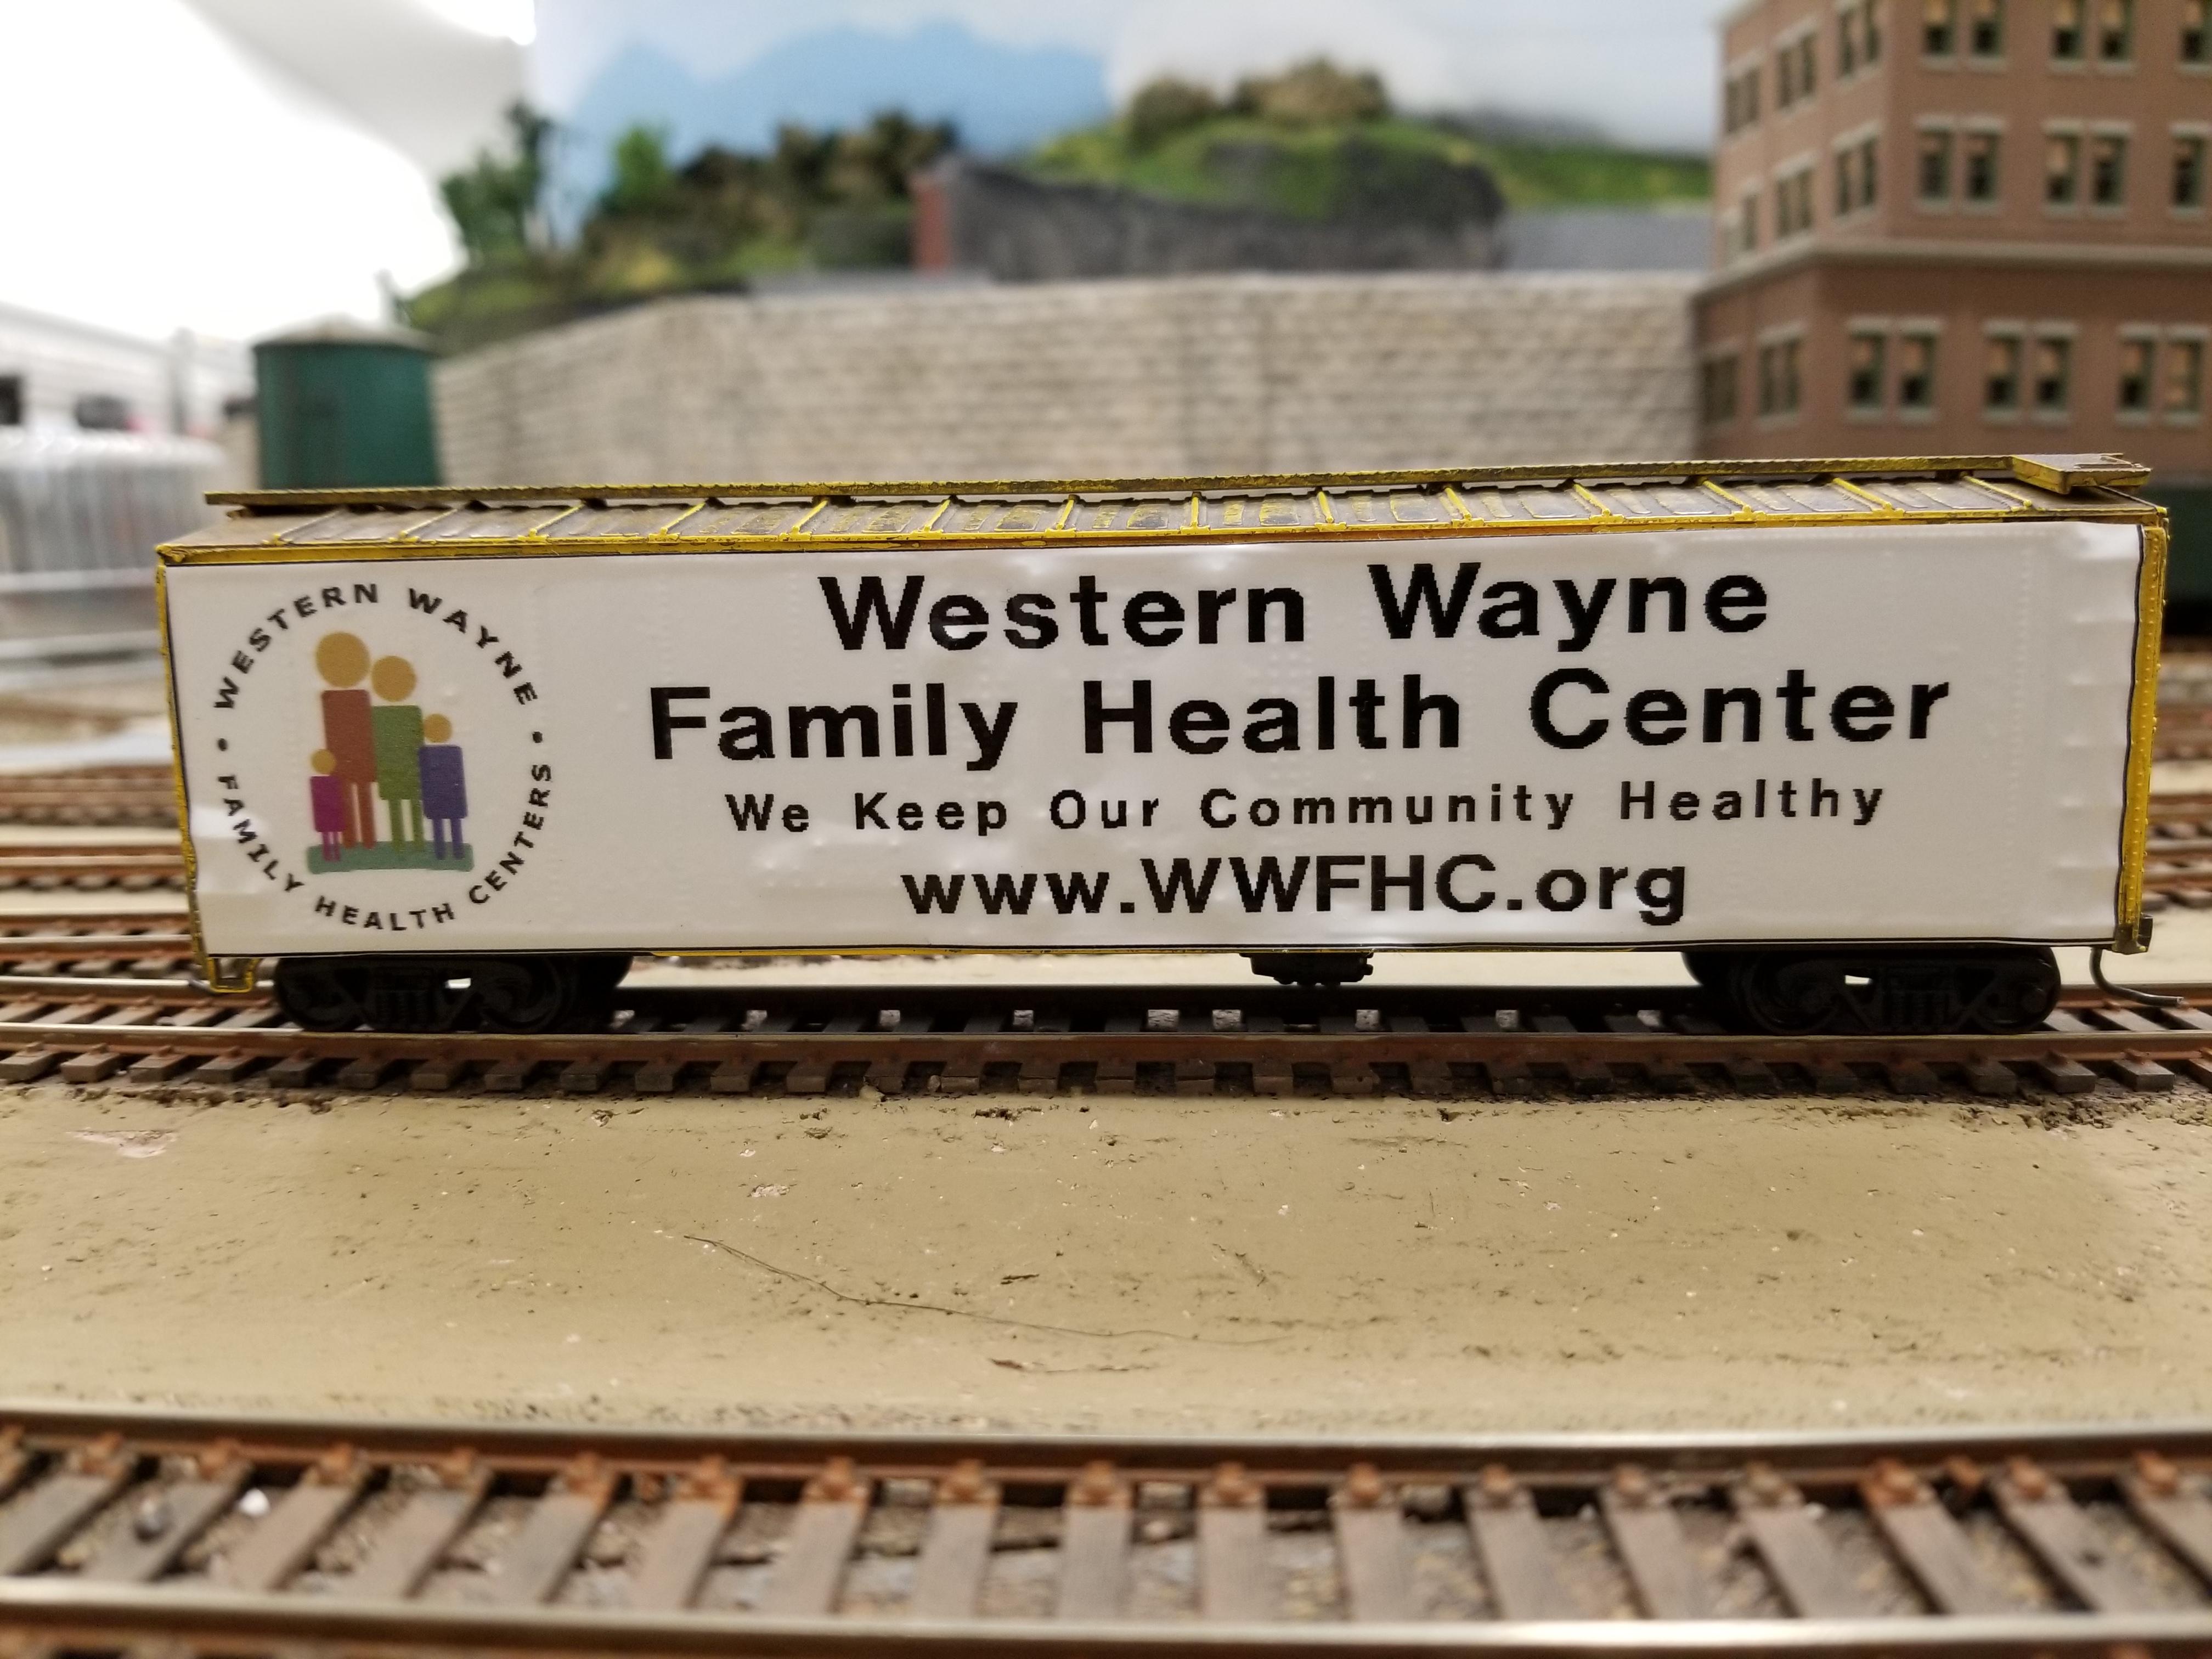 Western Wayne Family Health Center